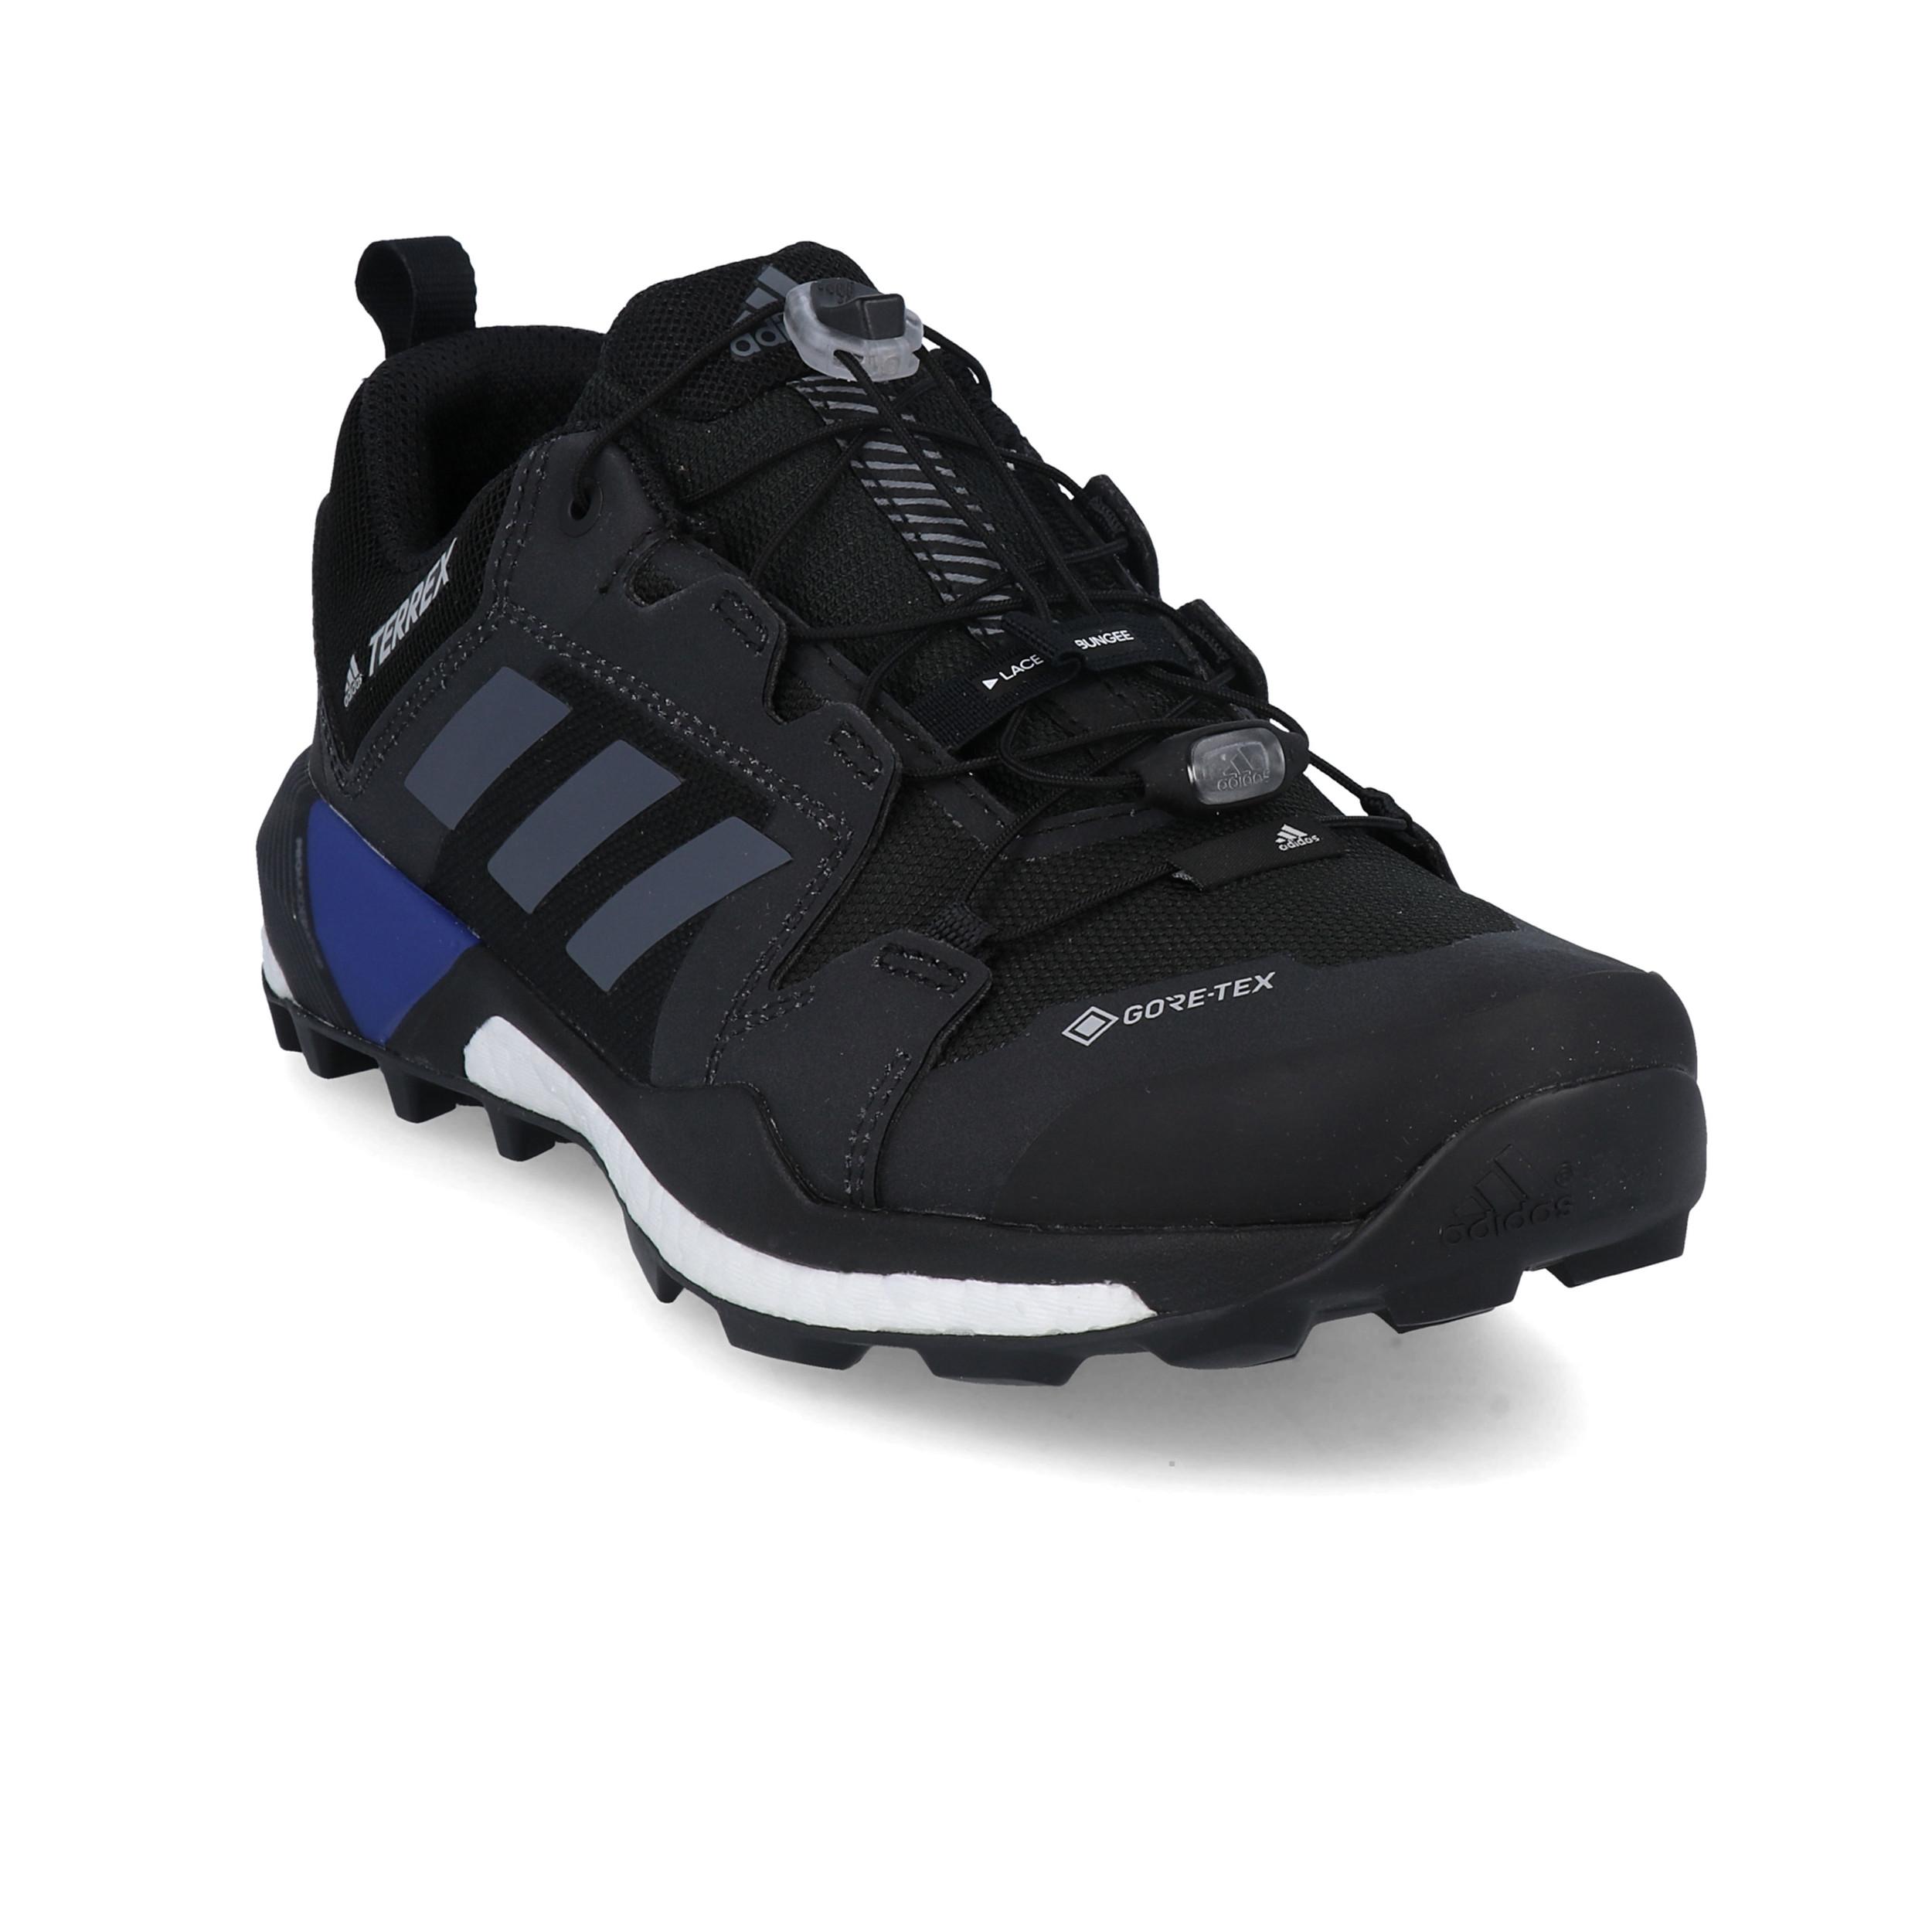 ADIDAS-Da-Uomo-Terrex-skychaser-XT-GORE-TEX-TRAIL-RUNNING-scarpe-da-ginnastica miniatura 34